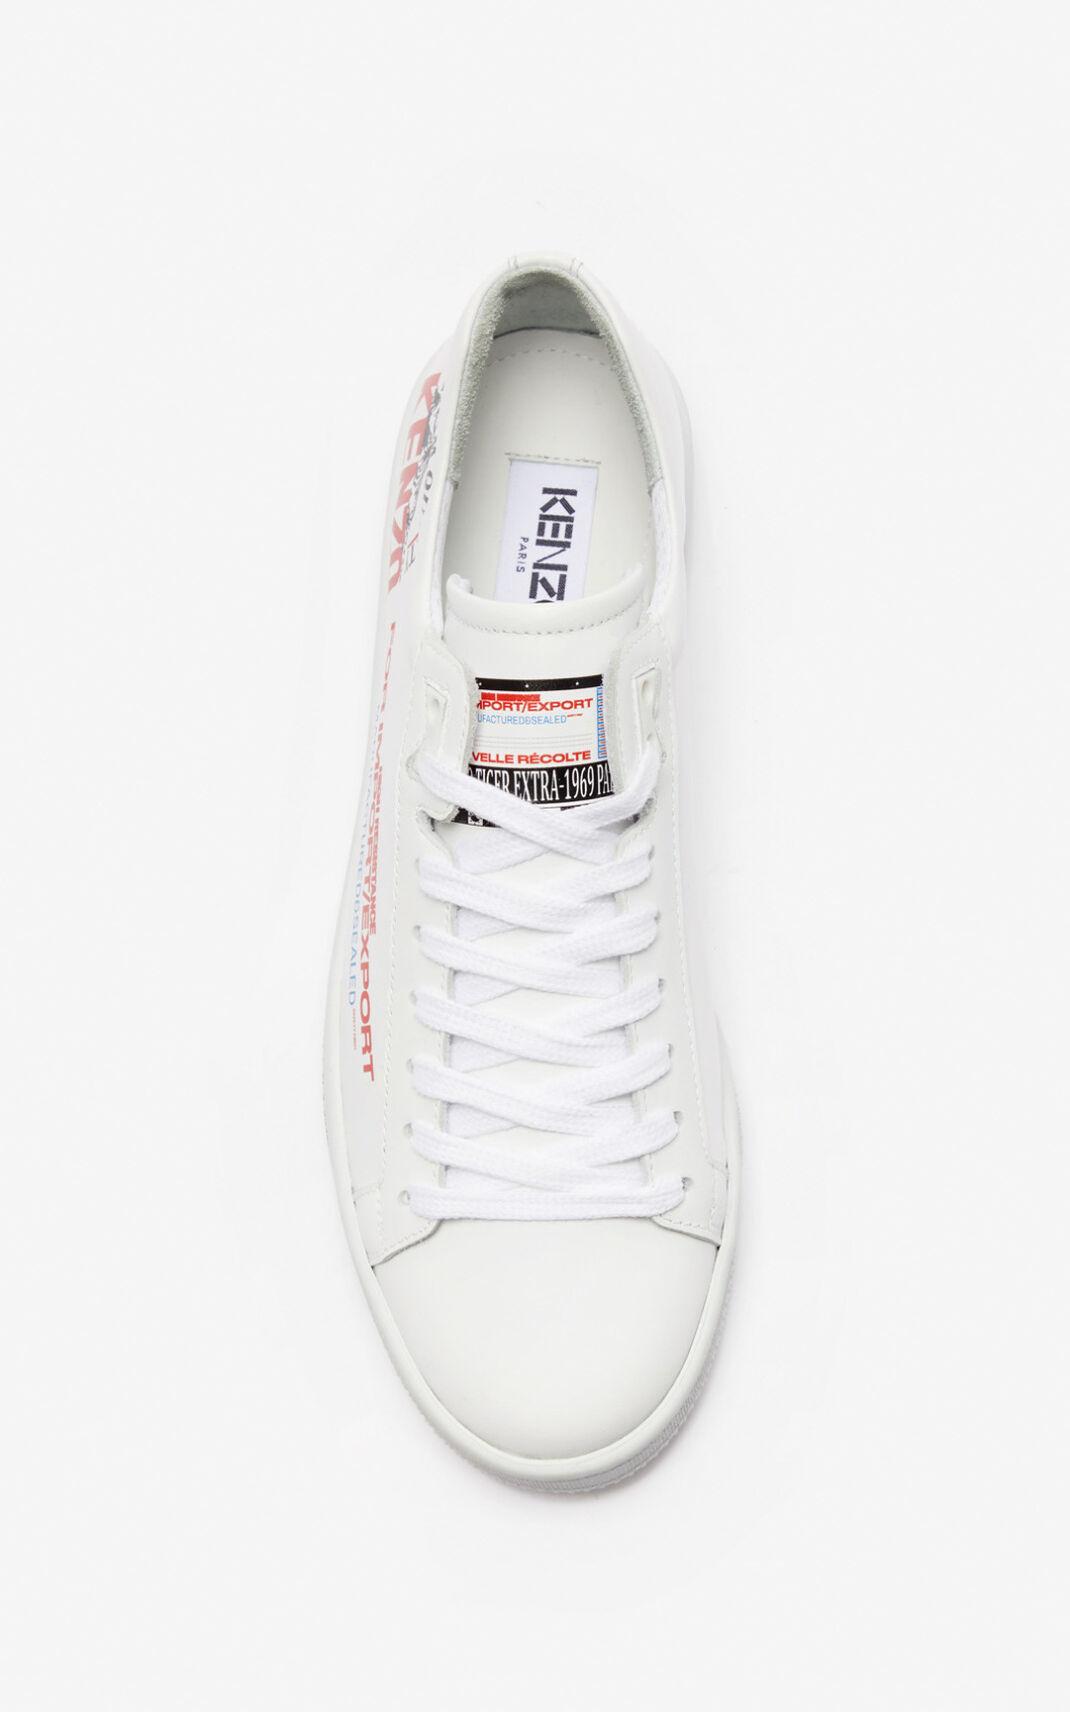 KENZO Kenzo - Unisex Tennix Low Top Sneakers